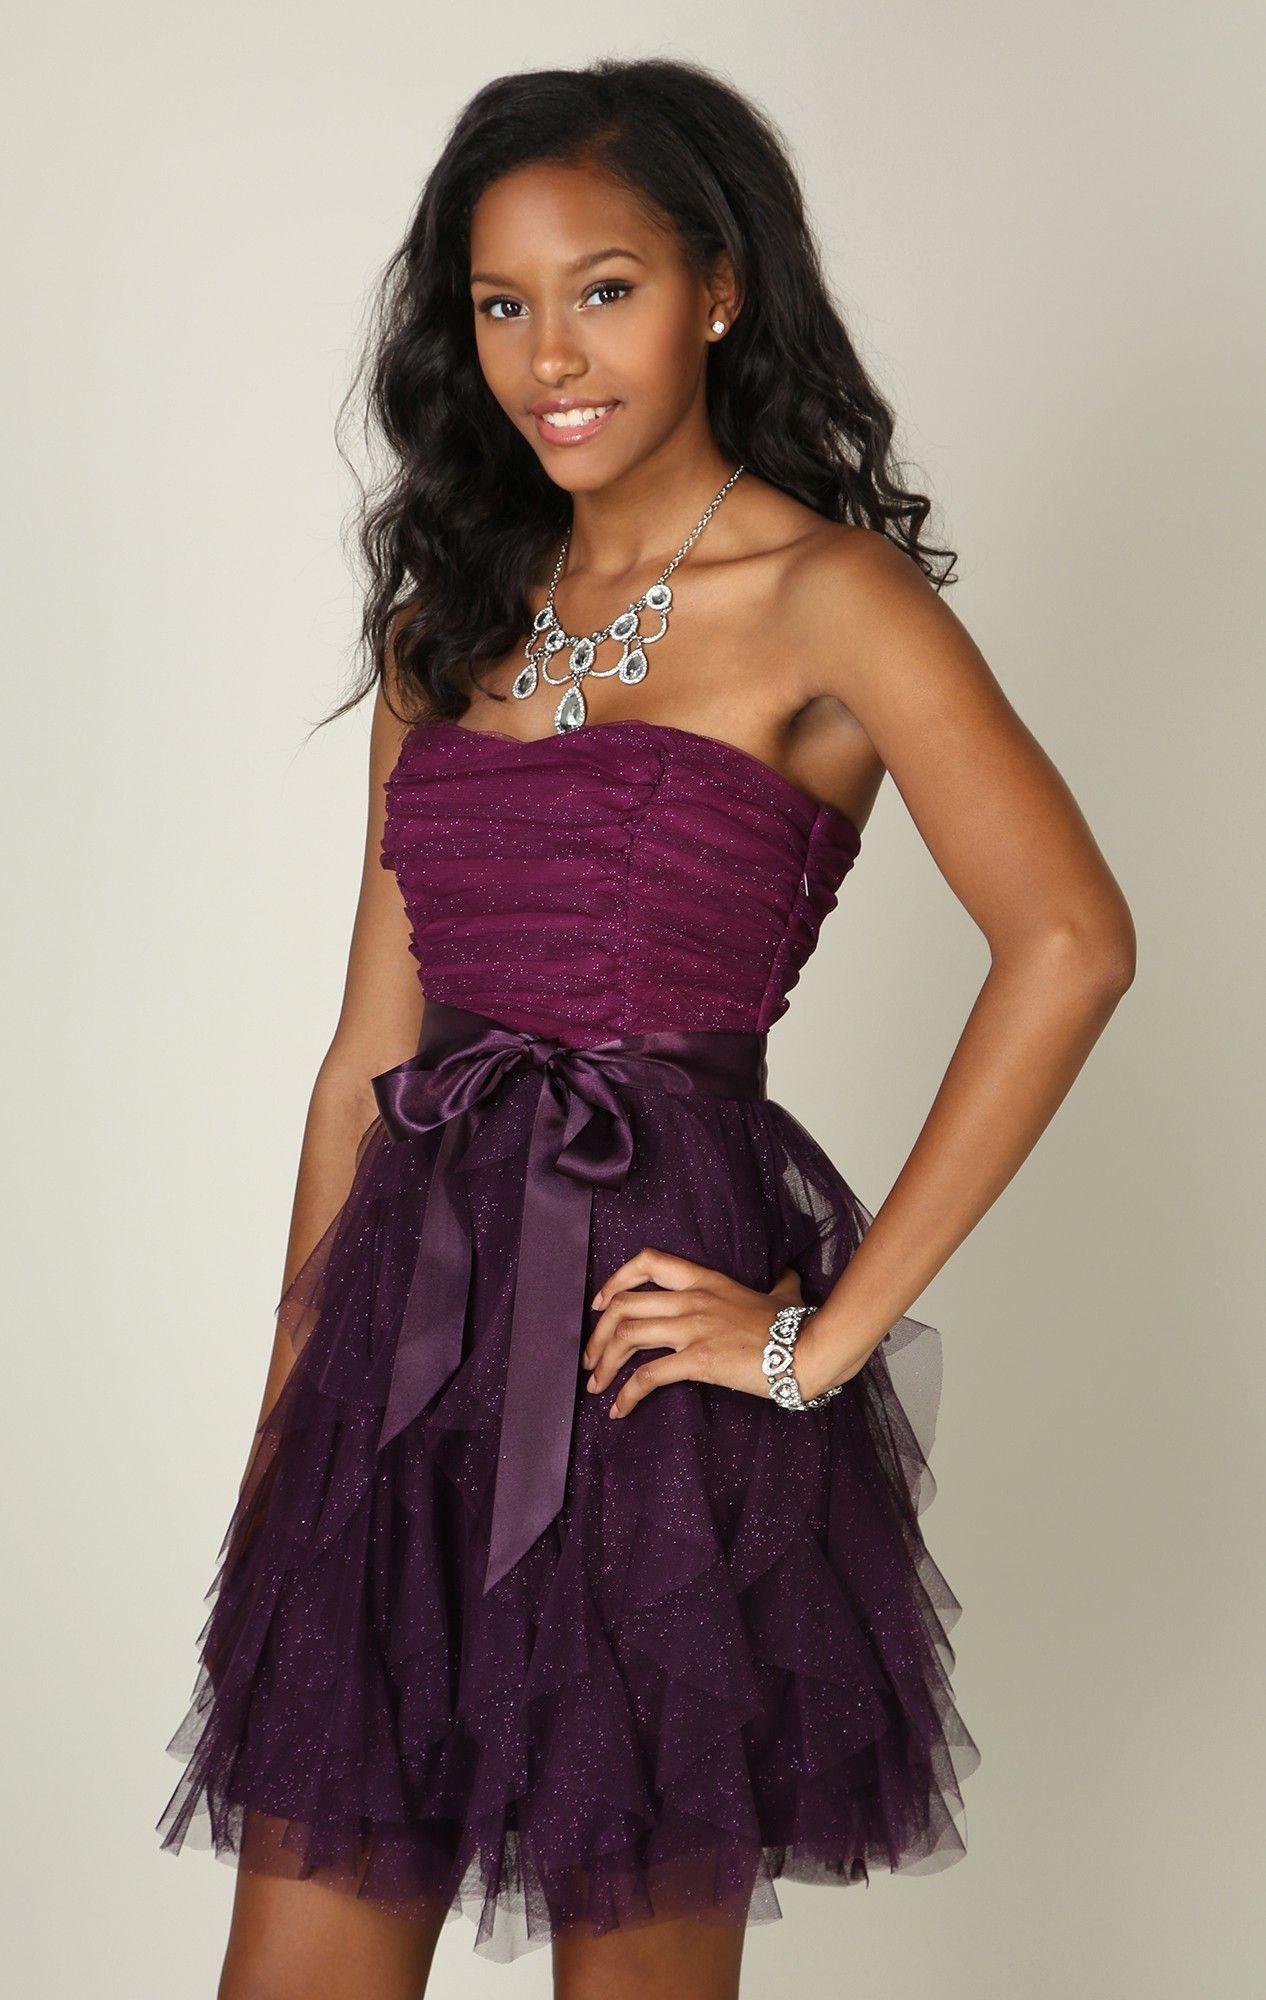 Glitter mesh strapless dress with ruched twist straight hem skirt